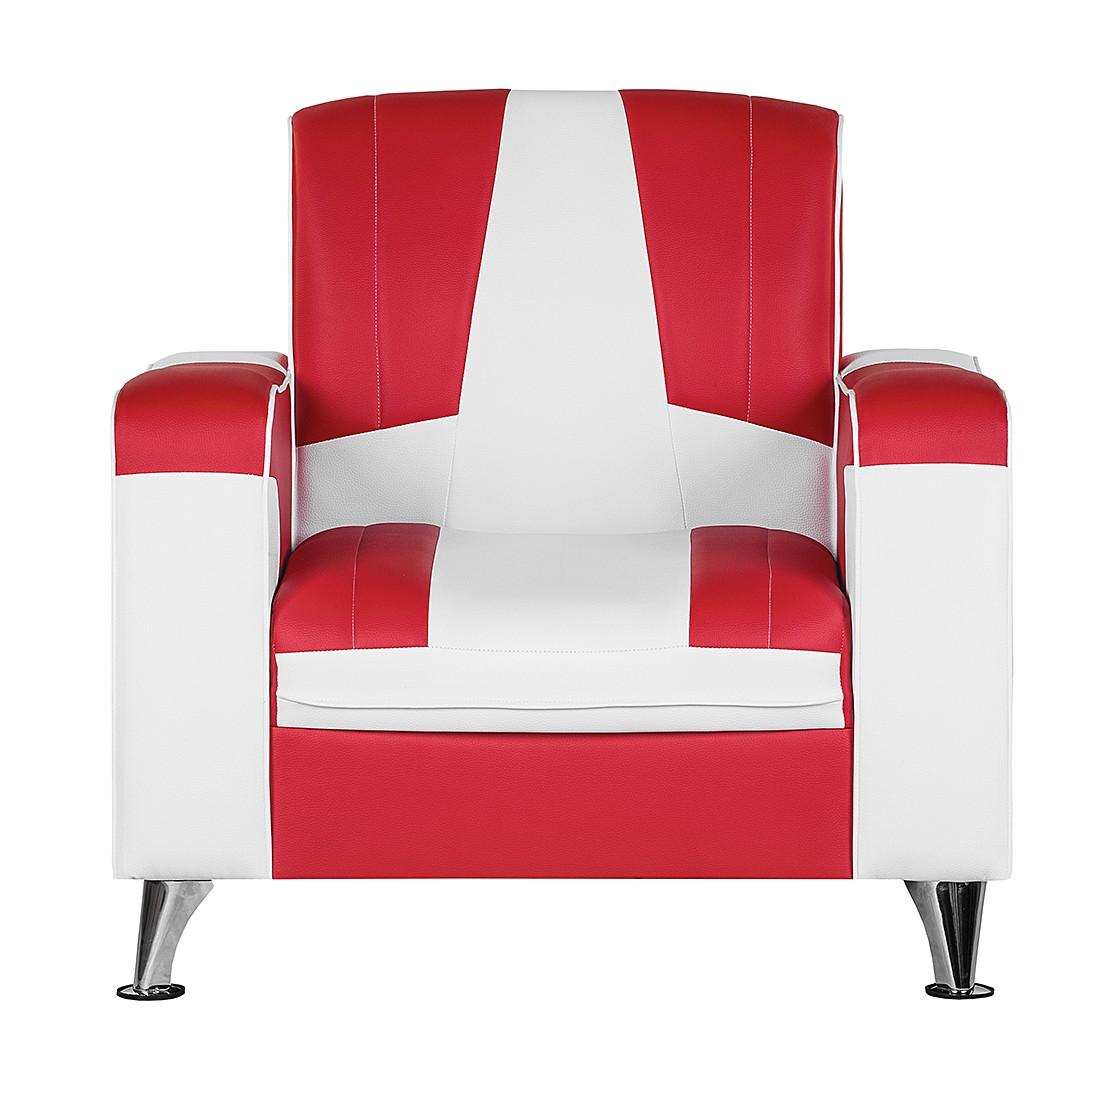 Sessel Nixa – Kunstleder Rot/Weiß, Studio Monroe günstig bestellen